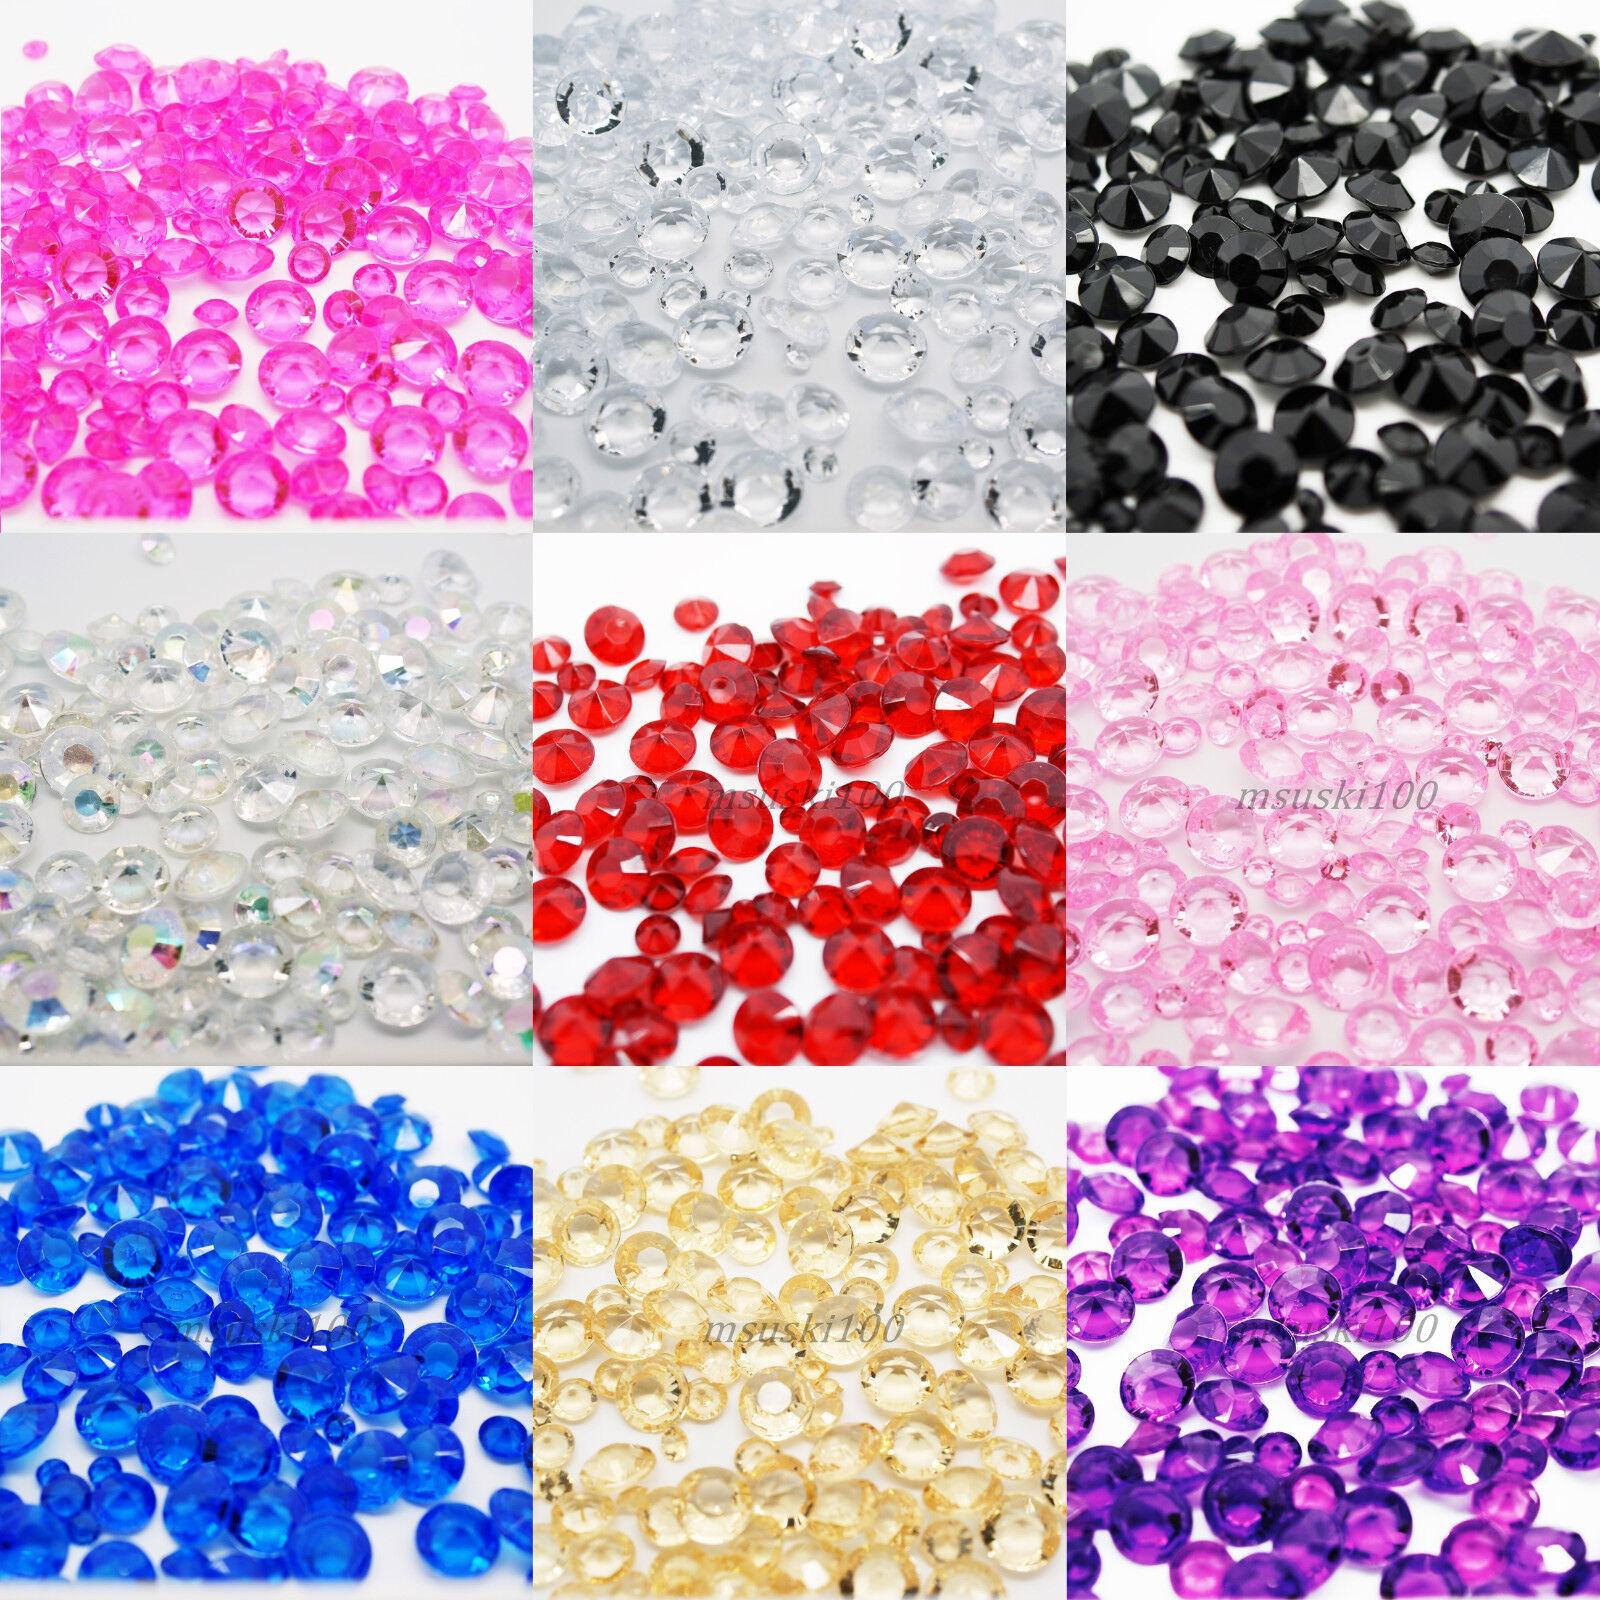 500 Confetti Diamond Shape 6.5mm 1ct Tabletop Crystal Gems Acrylic Bead Party